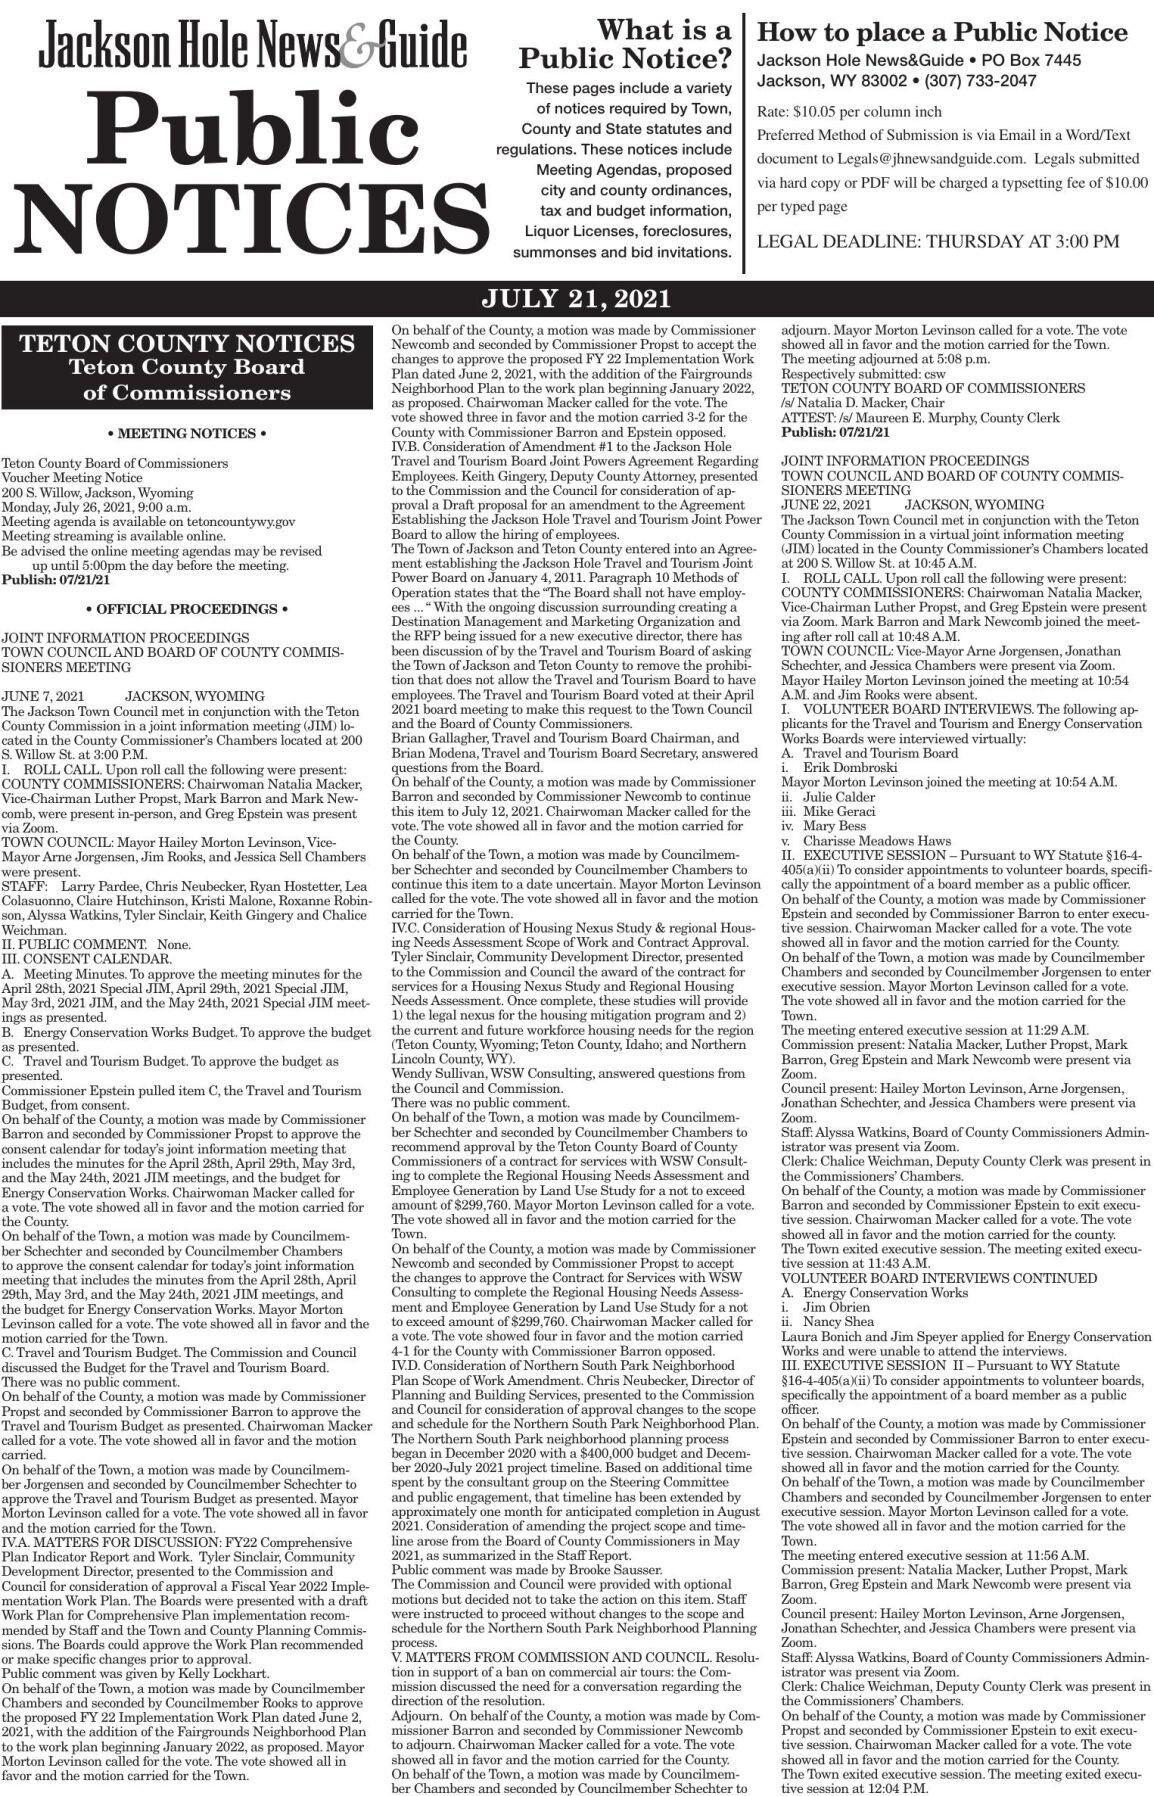 Public Notices, July 21, 2021